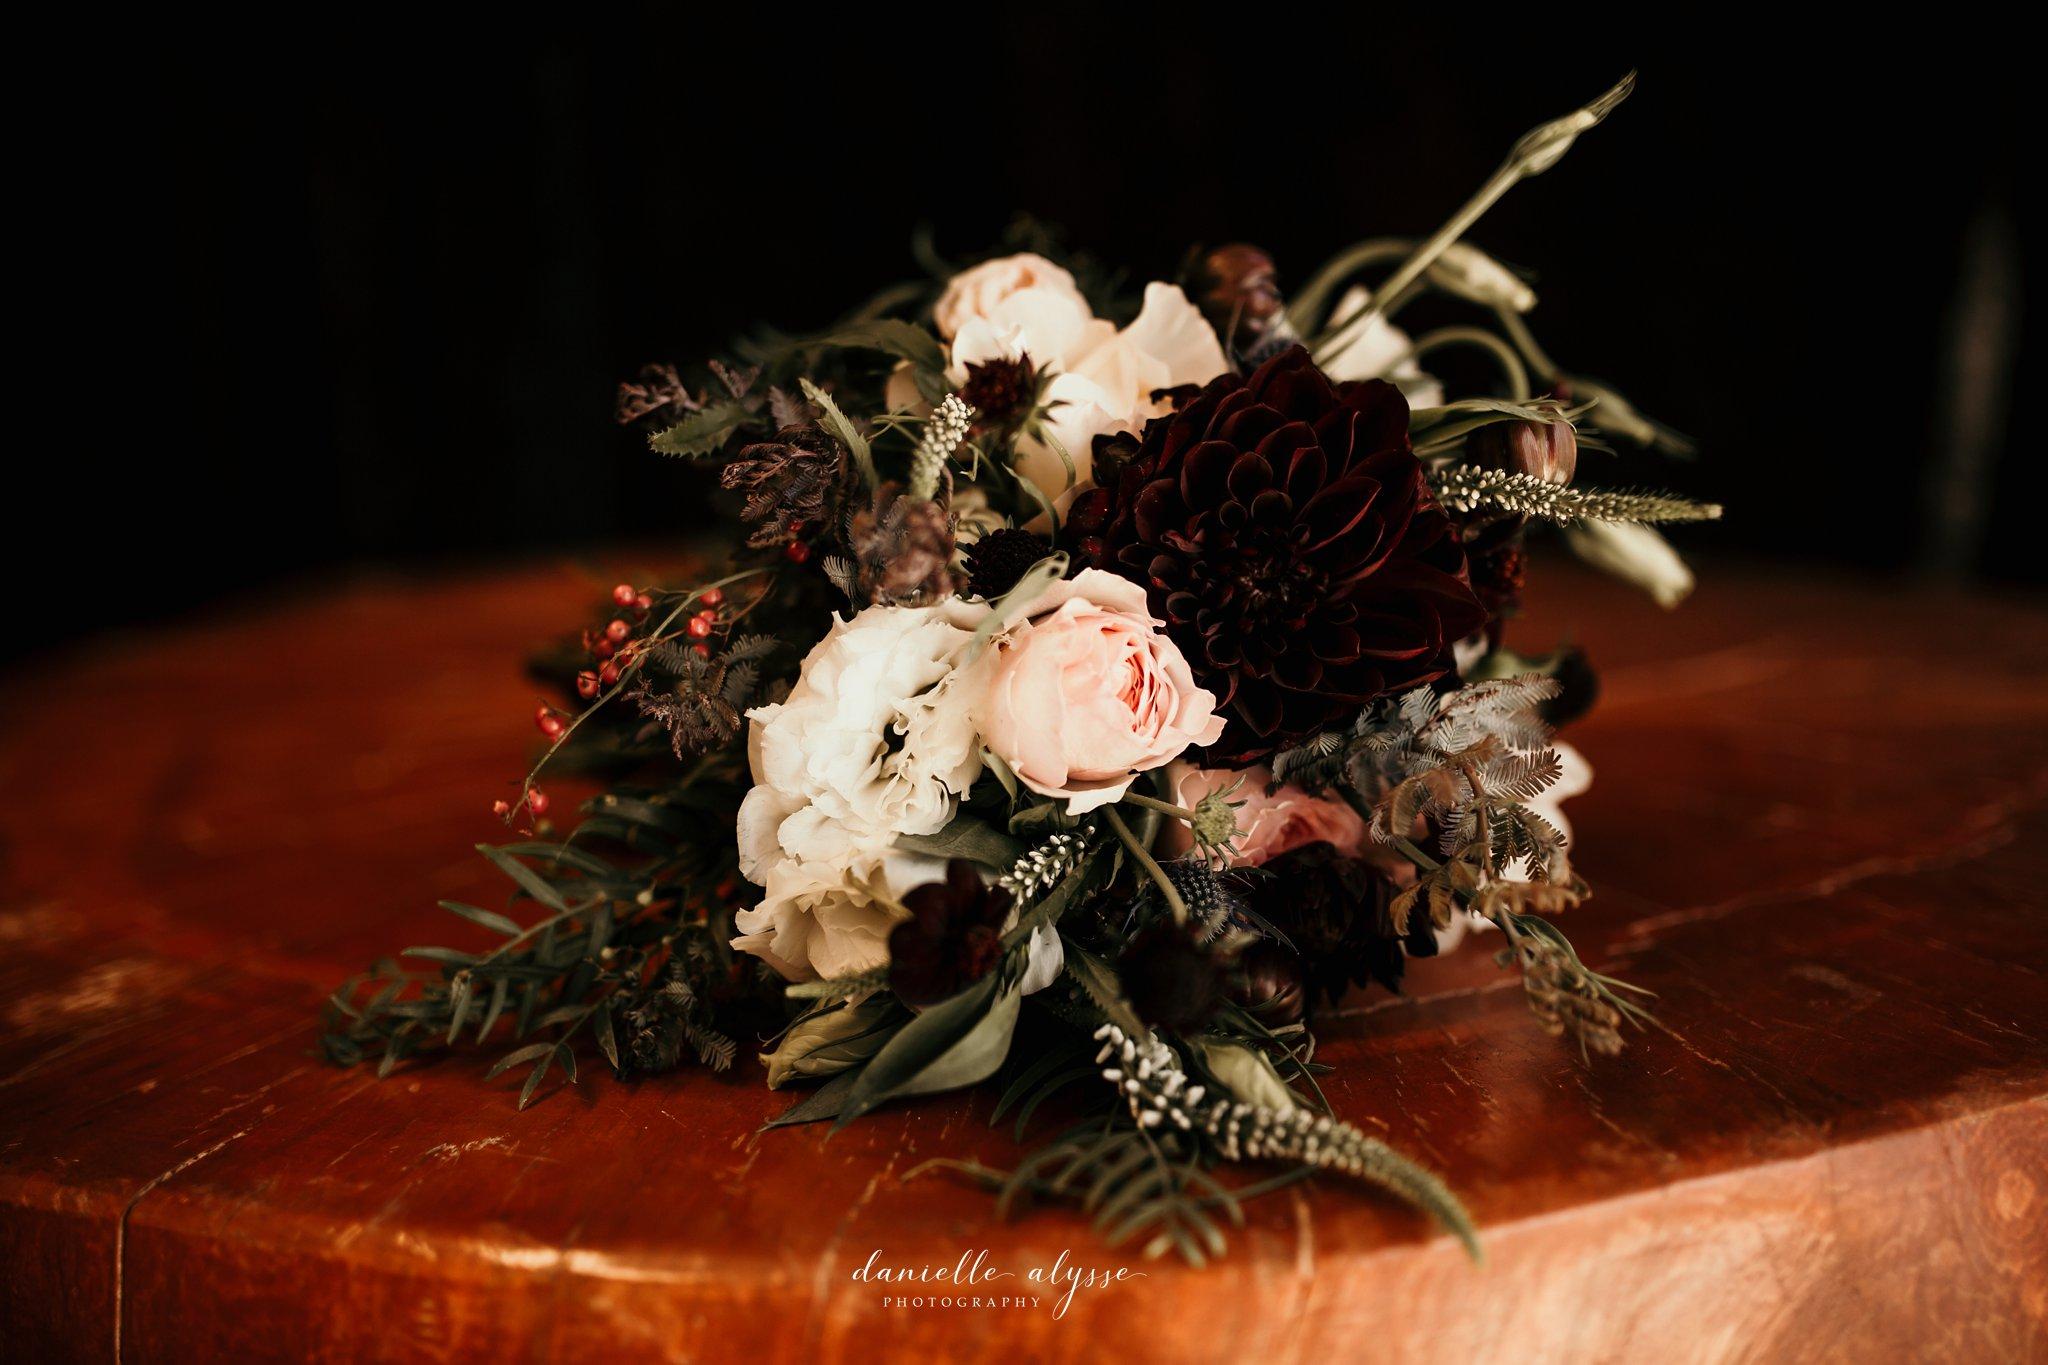 180831_wedding_stephanie_heavenly_south_lake_tahoe_danielle_alysse_photography_destination_blog_254_WEB.jpg